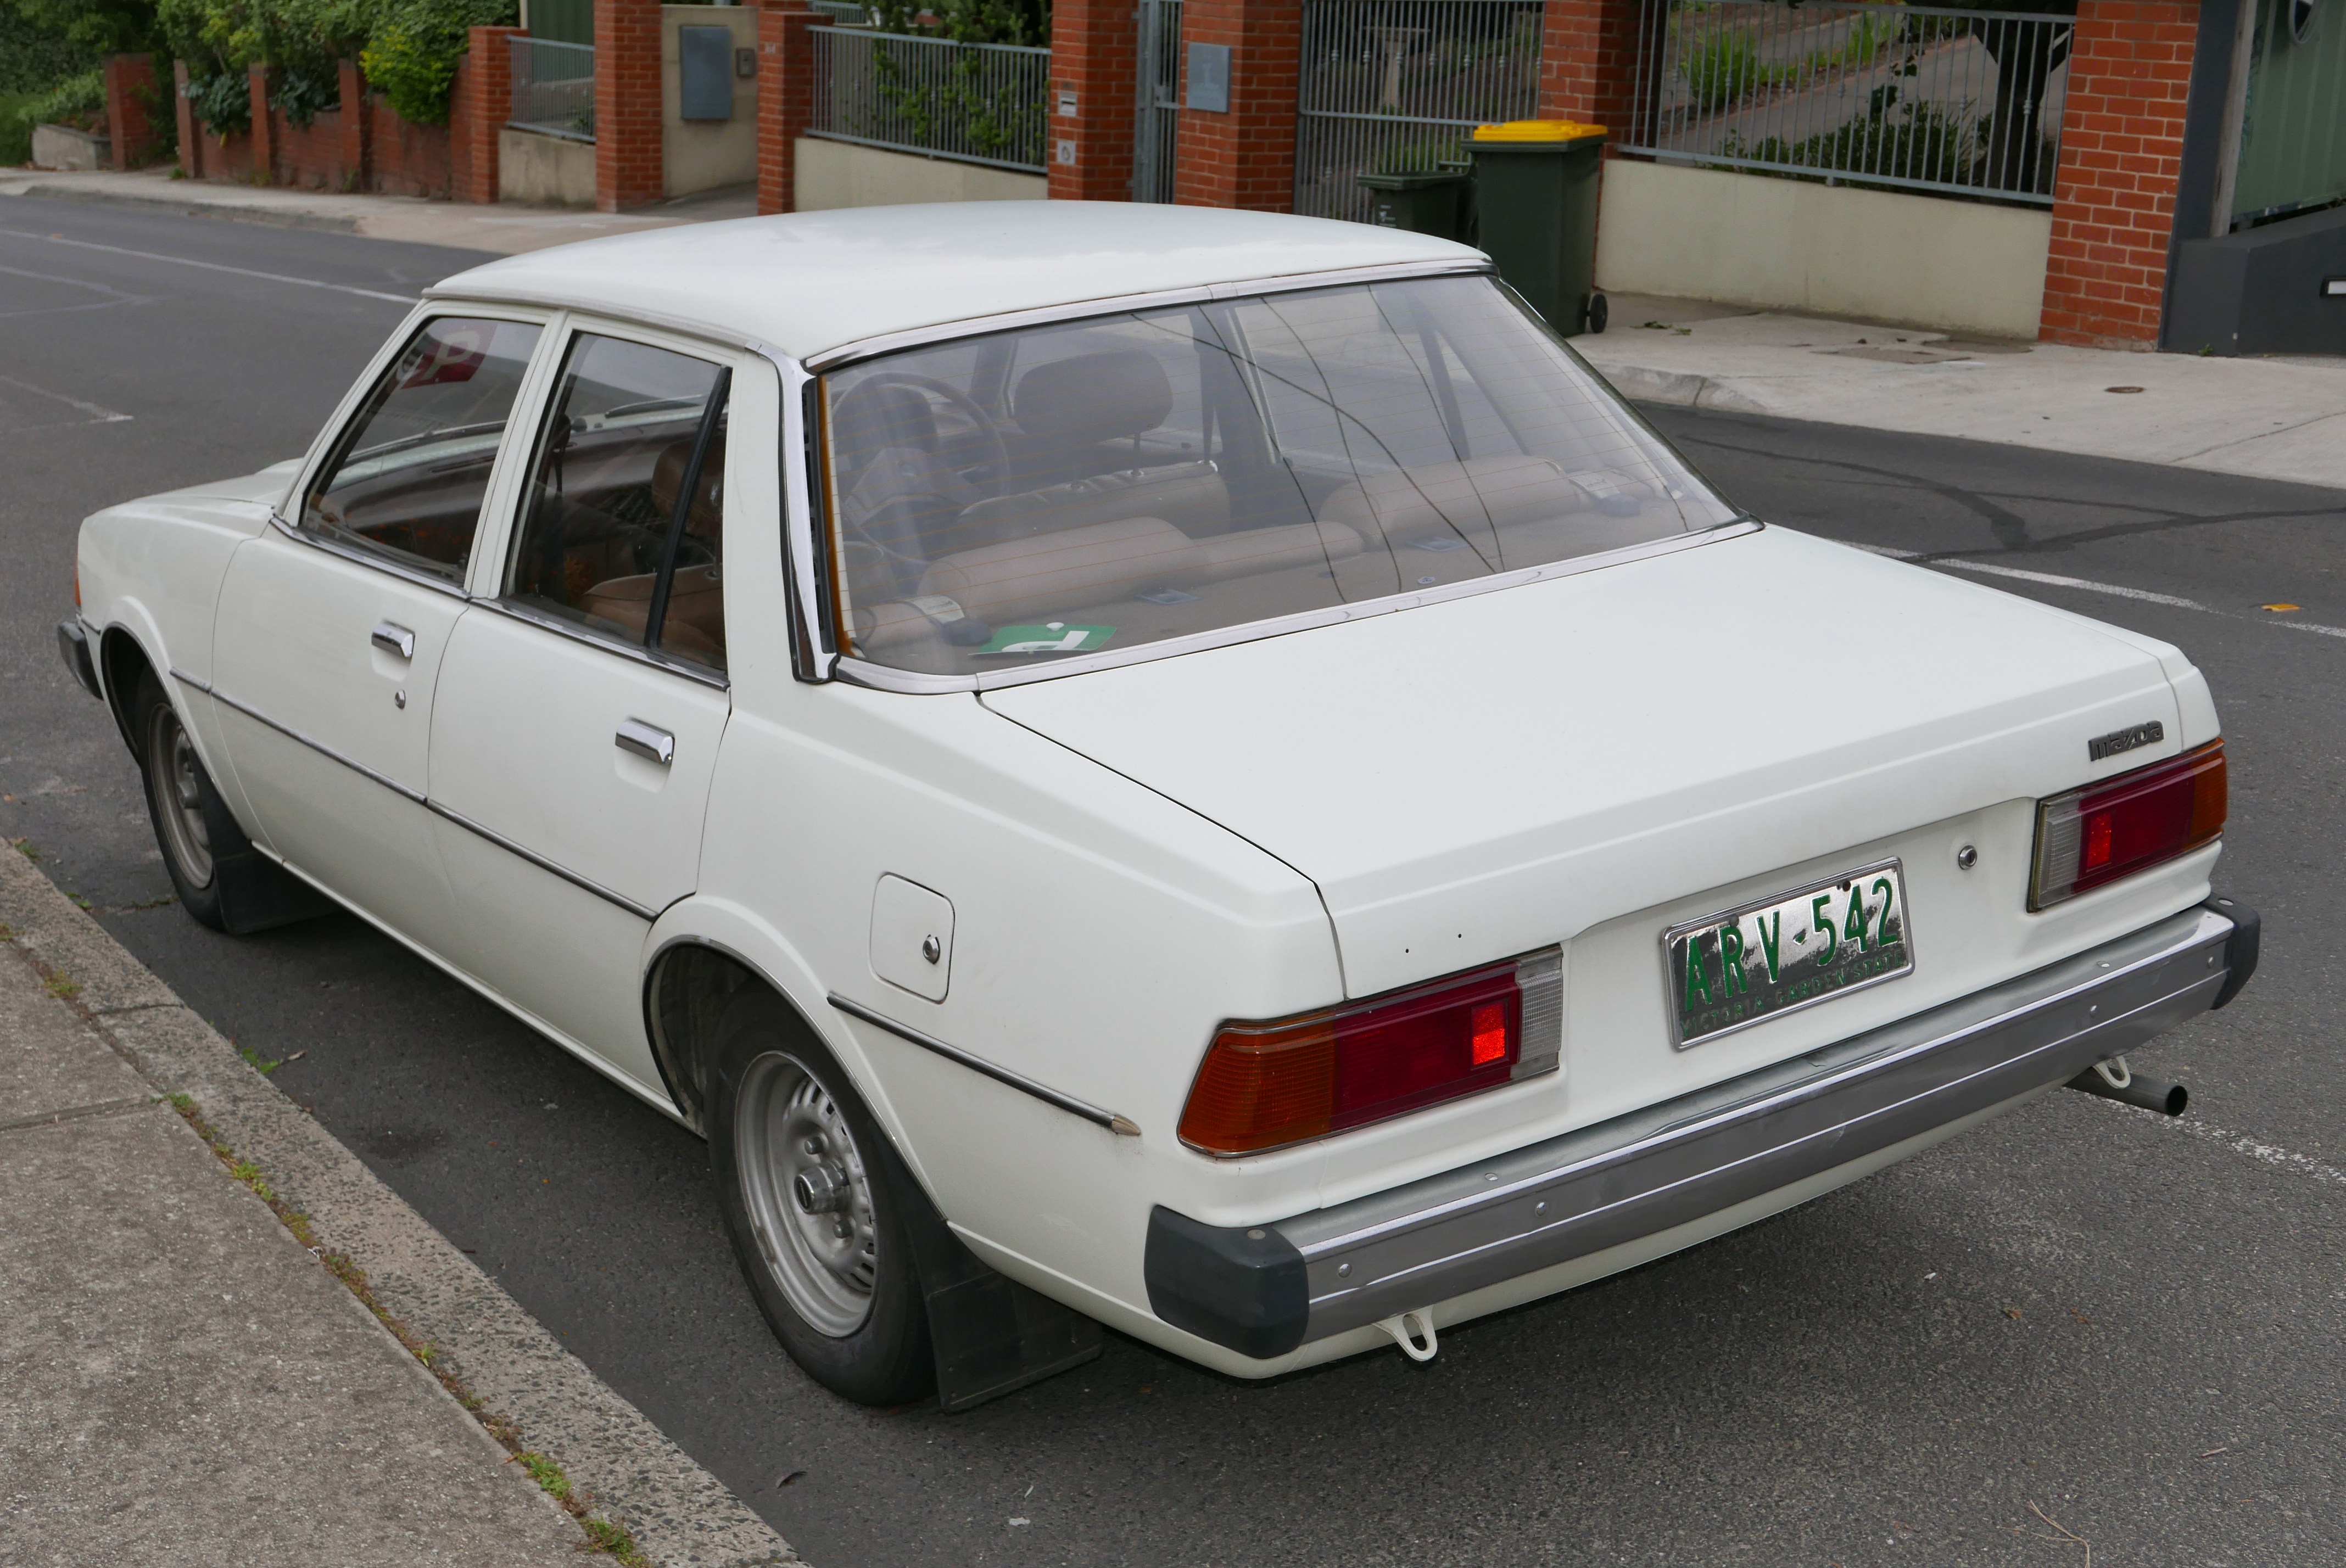 Mazda 626 I (CB) 1978 - 1982 Sedan #6